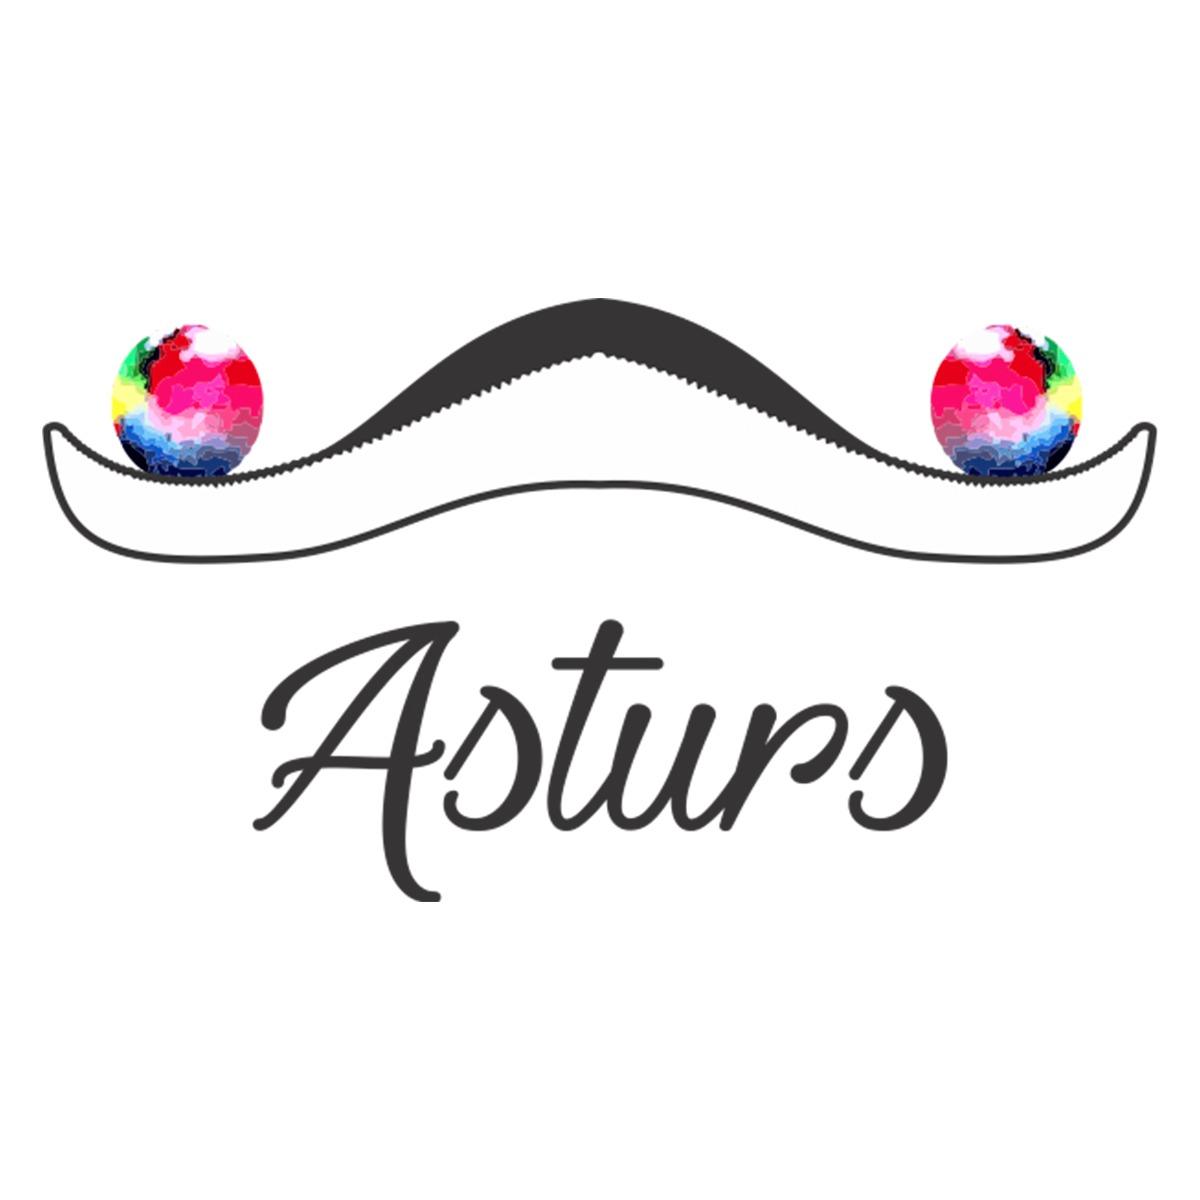 Asturs